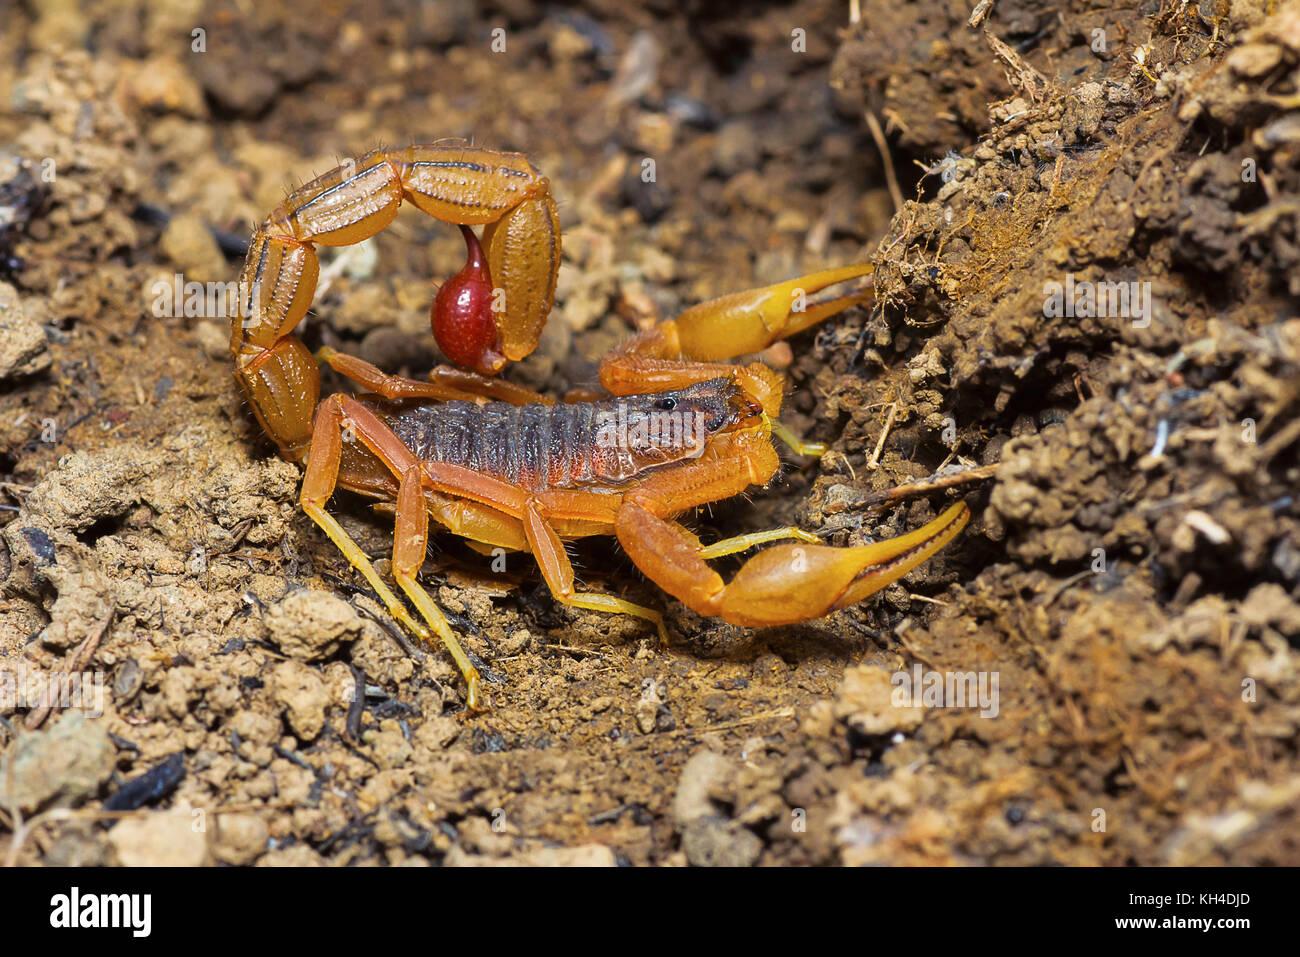 Scorpion Tail Stock Photos & Scorpion Tail Stock Images ... - photo#35